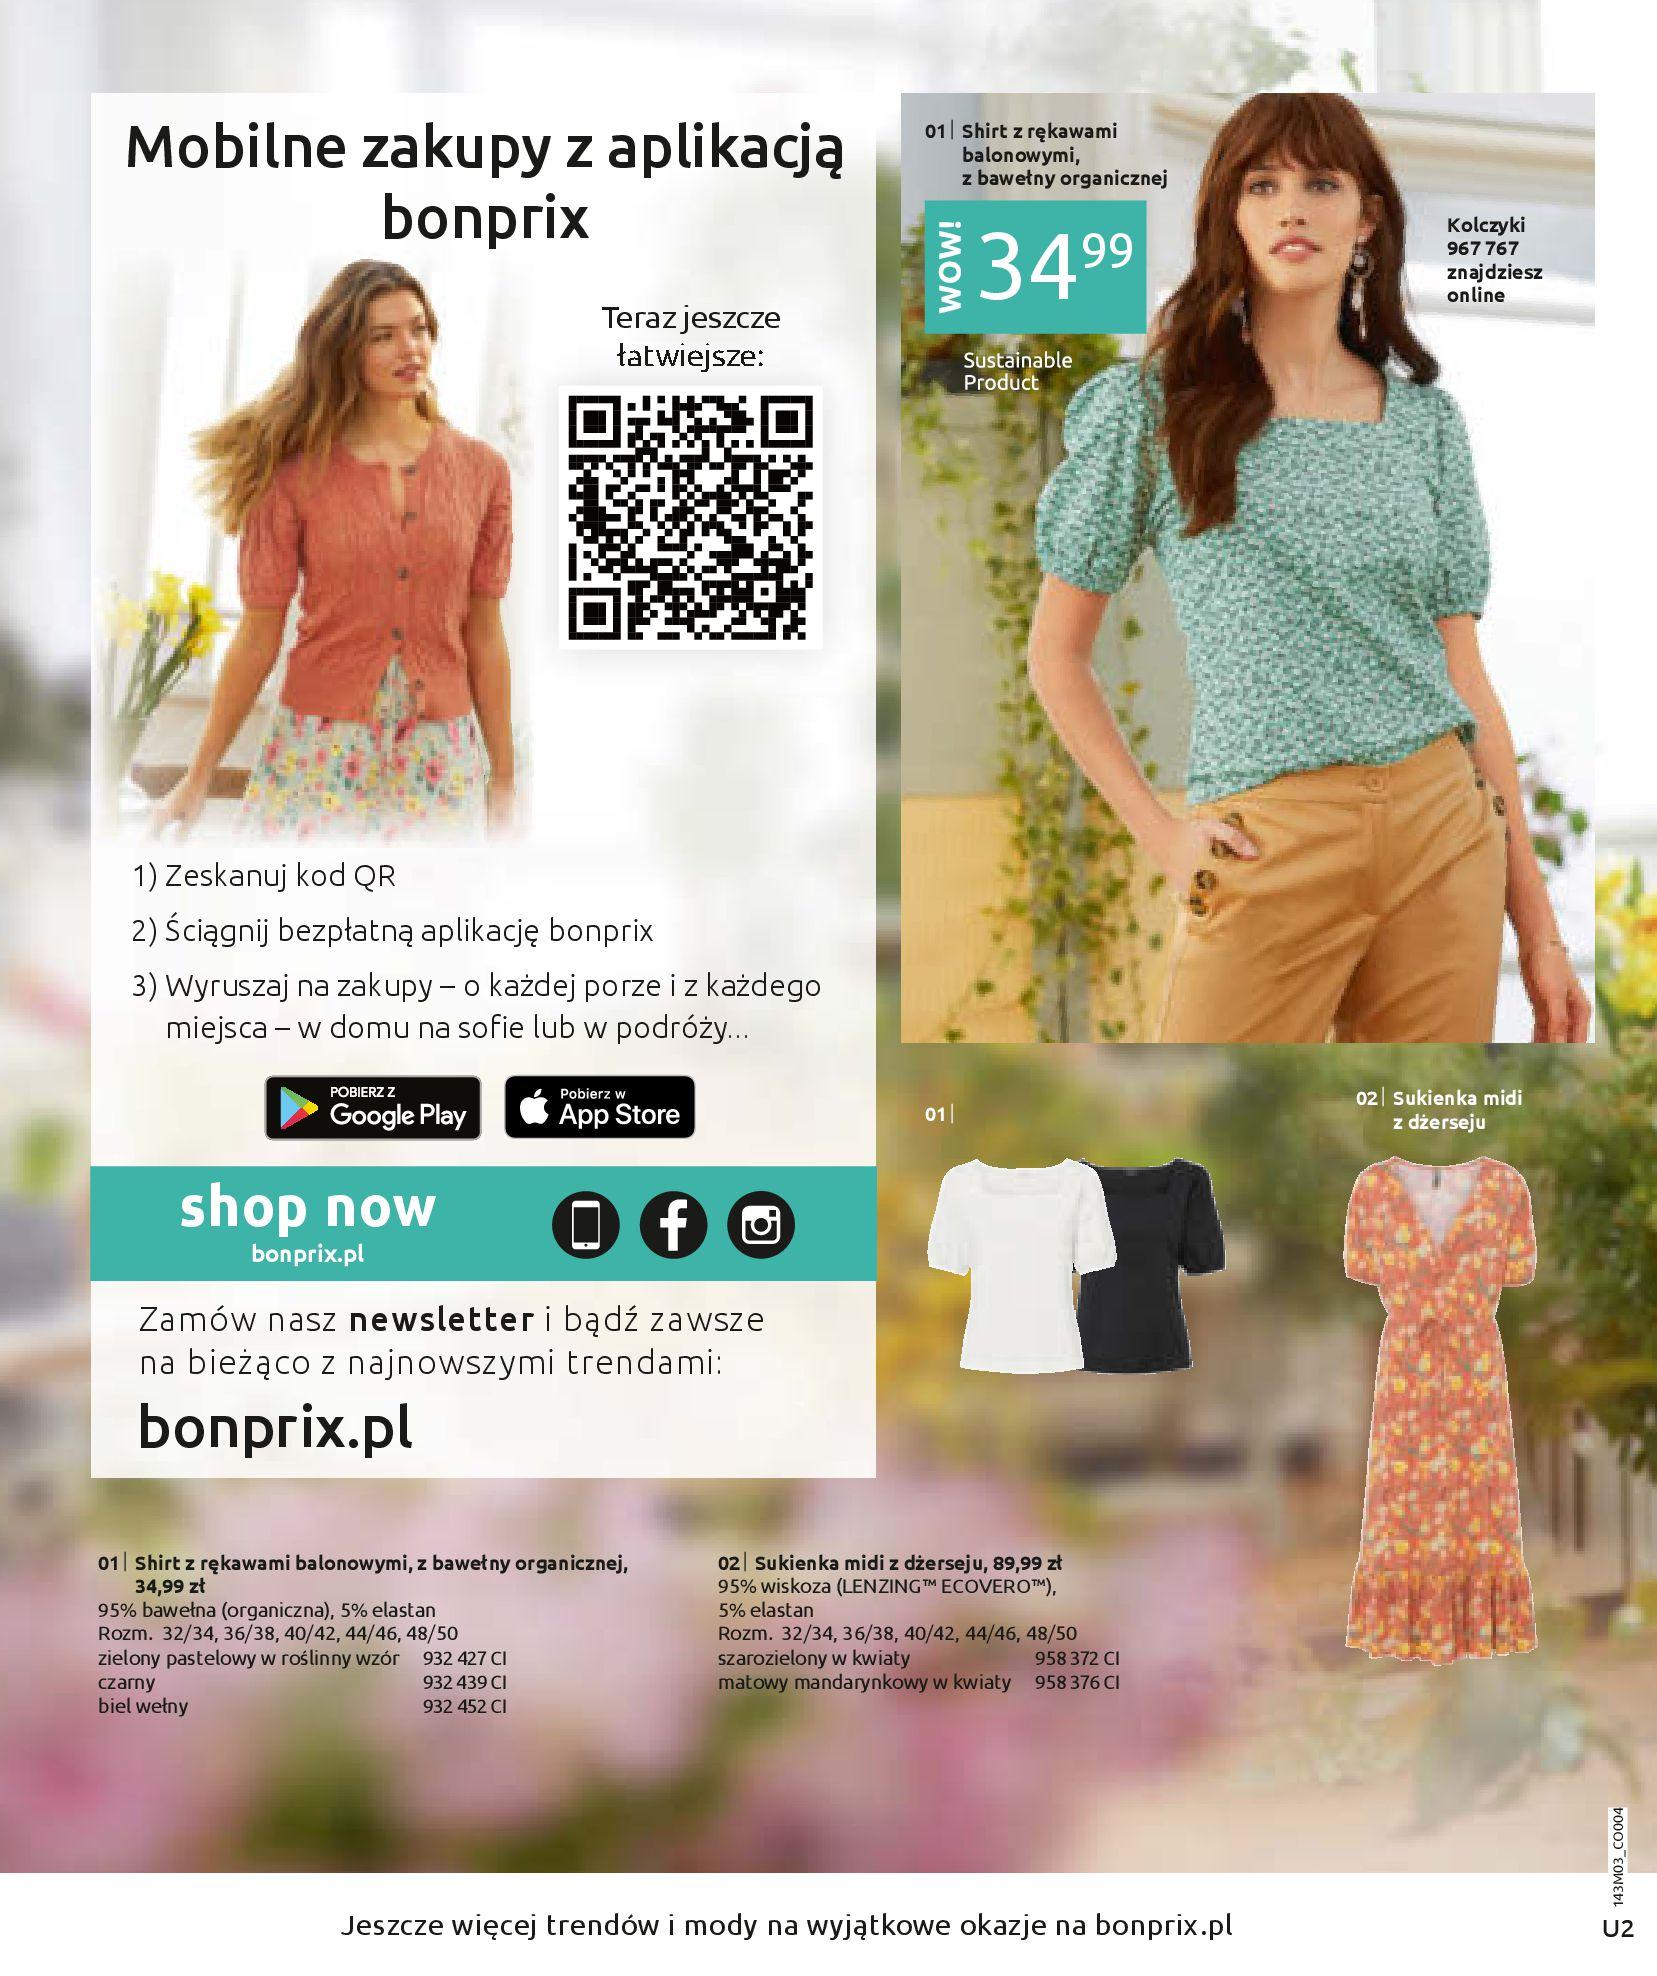 Gazetka Bonprix: Bonprix_IMPORTED_20210429084535 2021-04-29 page-2